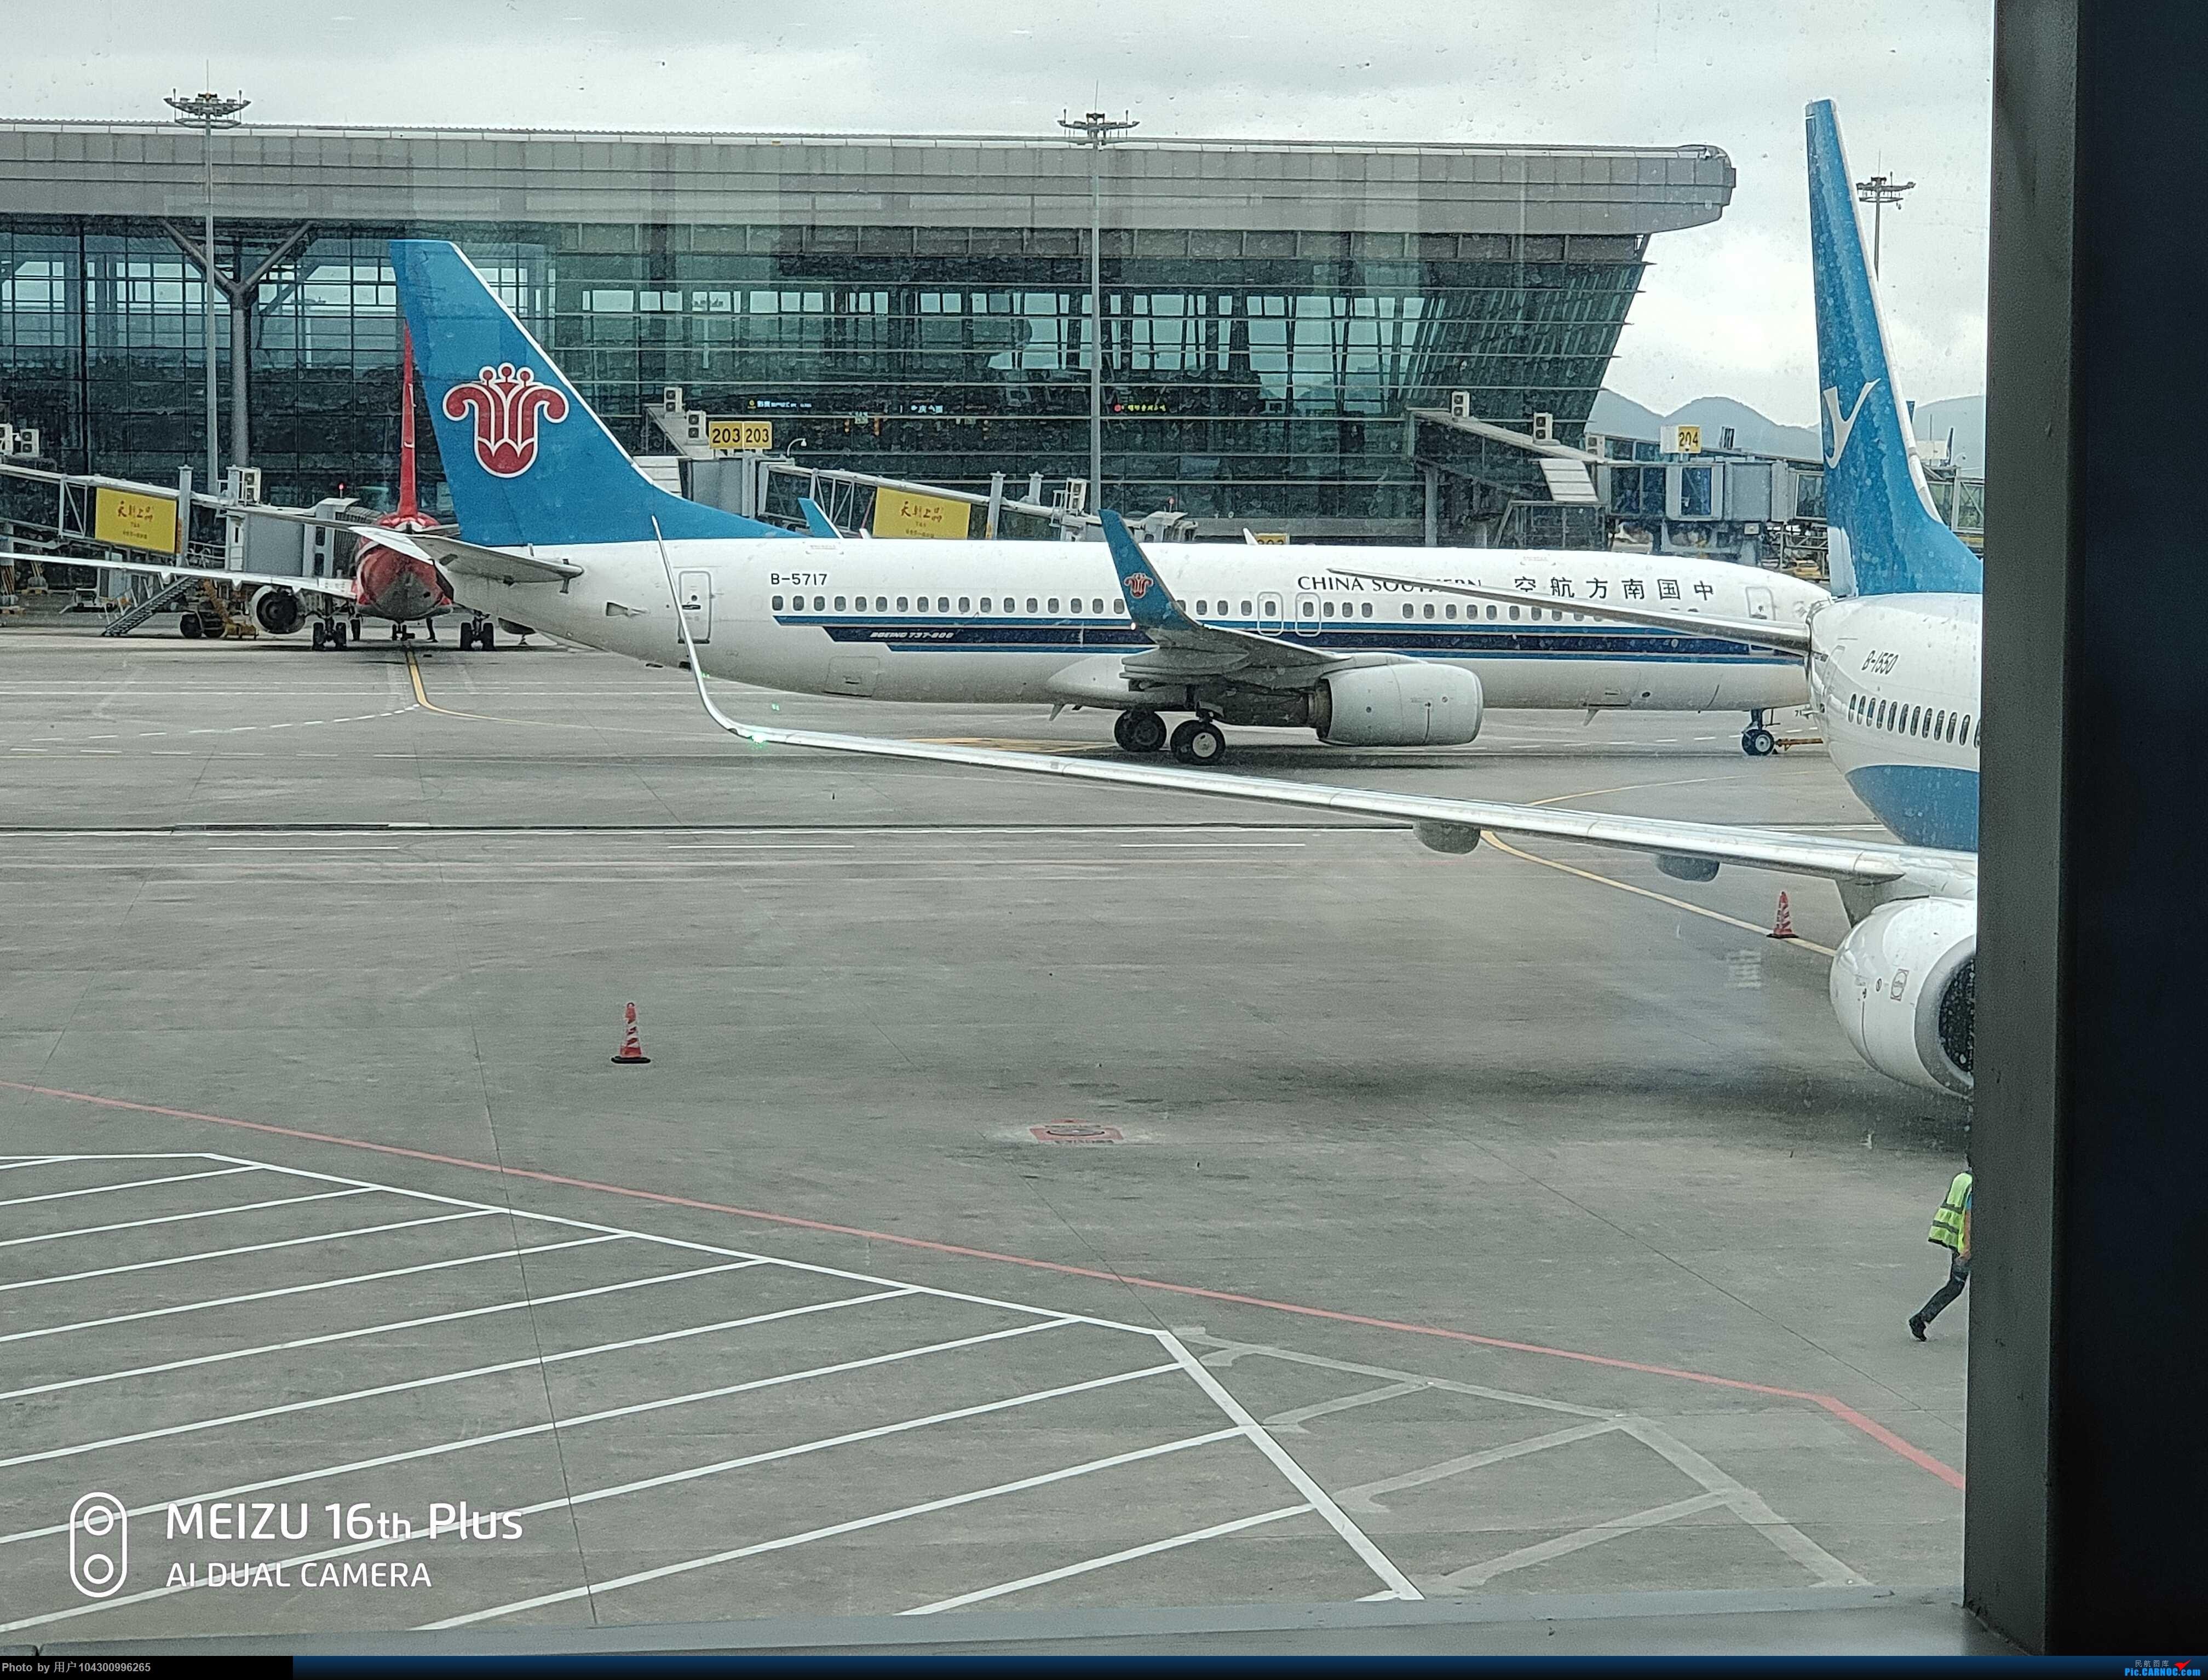 Re:[原创][DM哥飞行游记]-多彩贵州航空贵阳-茅台当日往返 BOEING 737-800 B-5717 中国贵阳龙洞堡国际机场